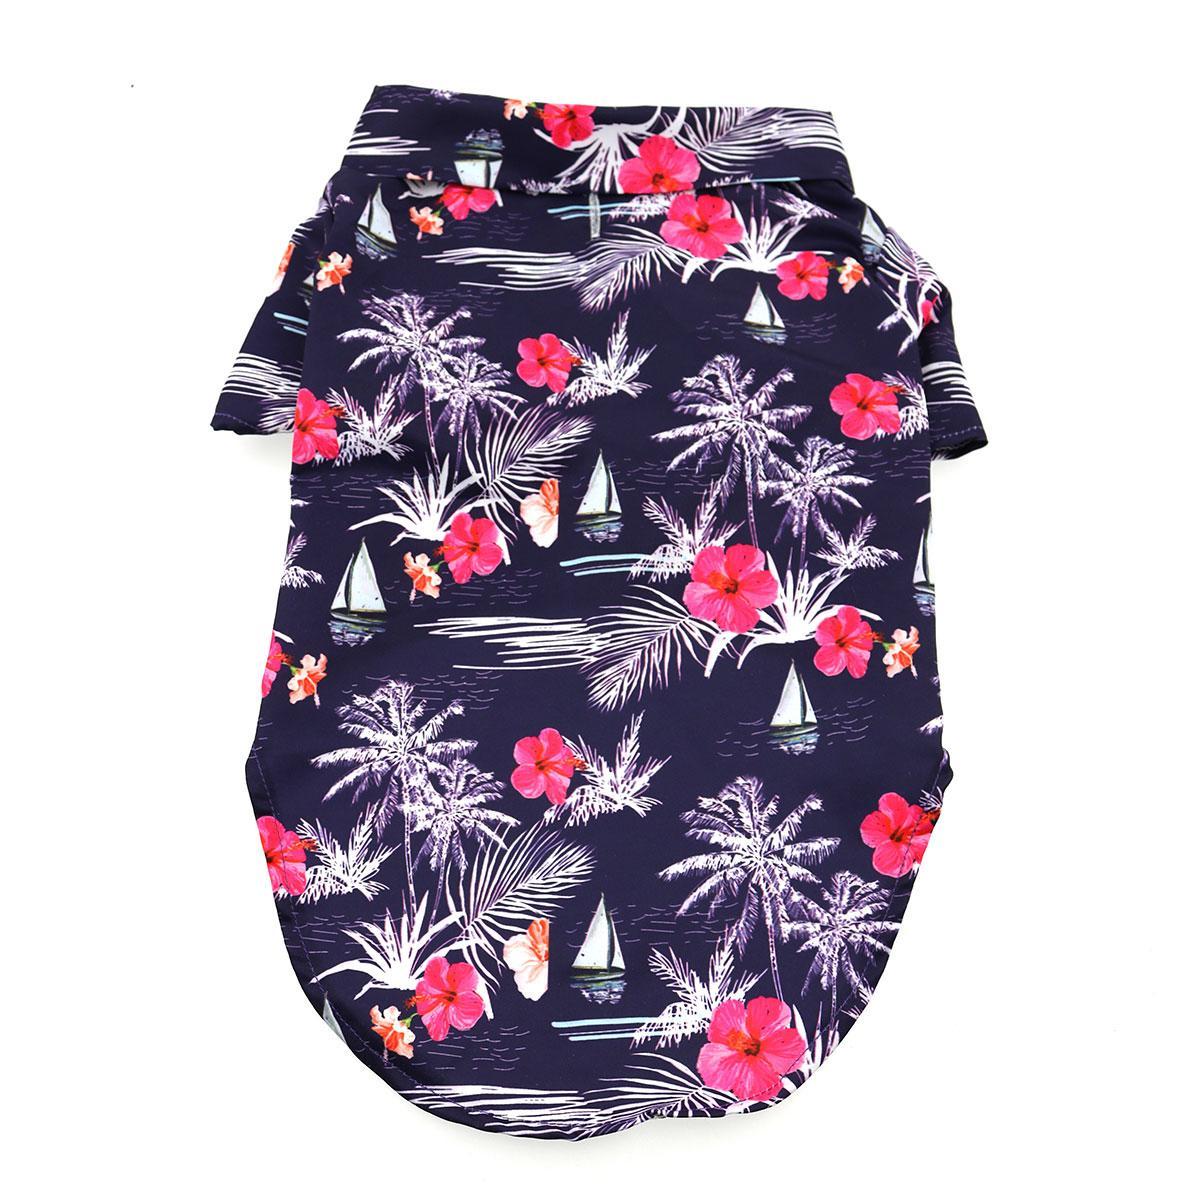 Hawaiian Camp Shirt by Doggie Design - Moonlight Sails